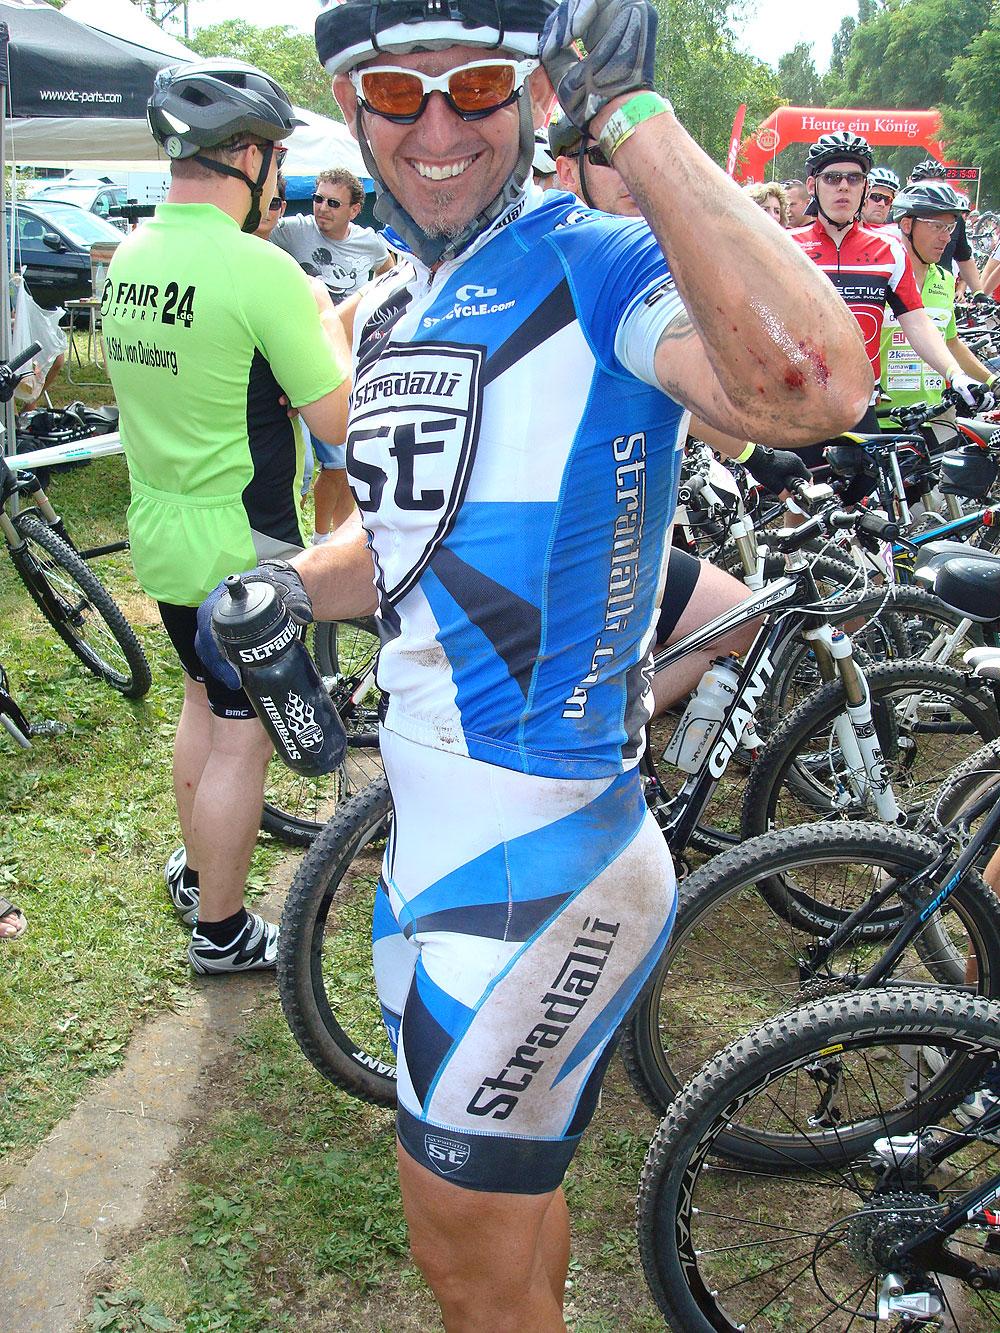 team_stradalli_mtb_races_grant_potter_crash.jpg